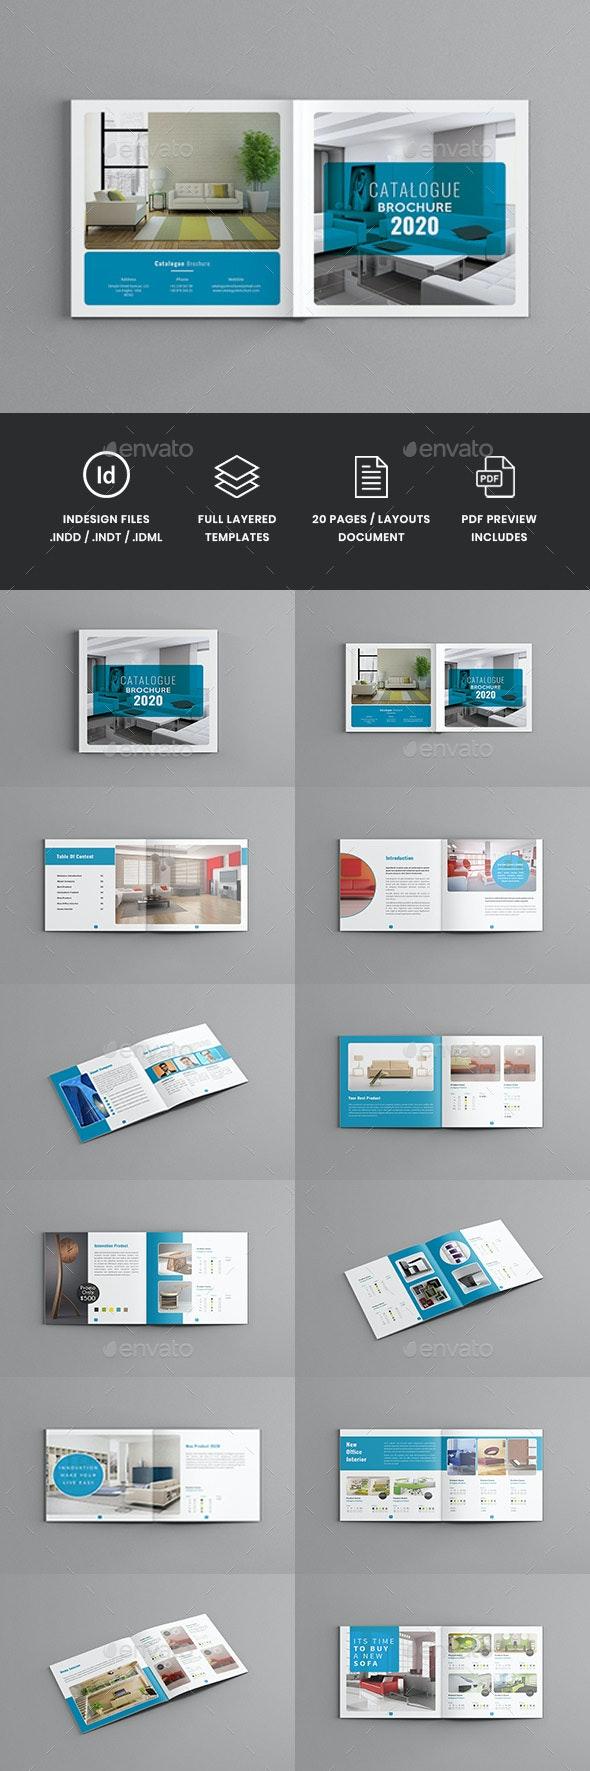 Famella - Square Minimal Catalogue Brochure Template - Corporate Brochures